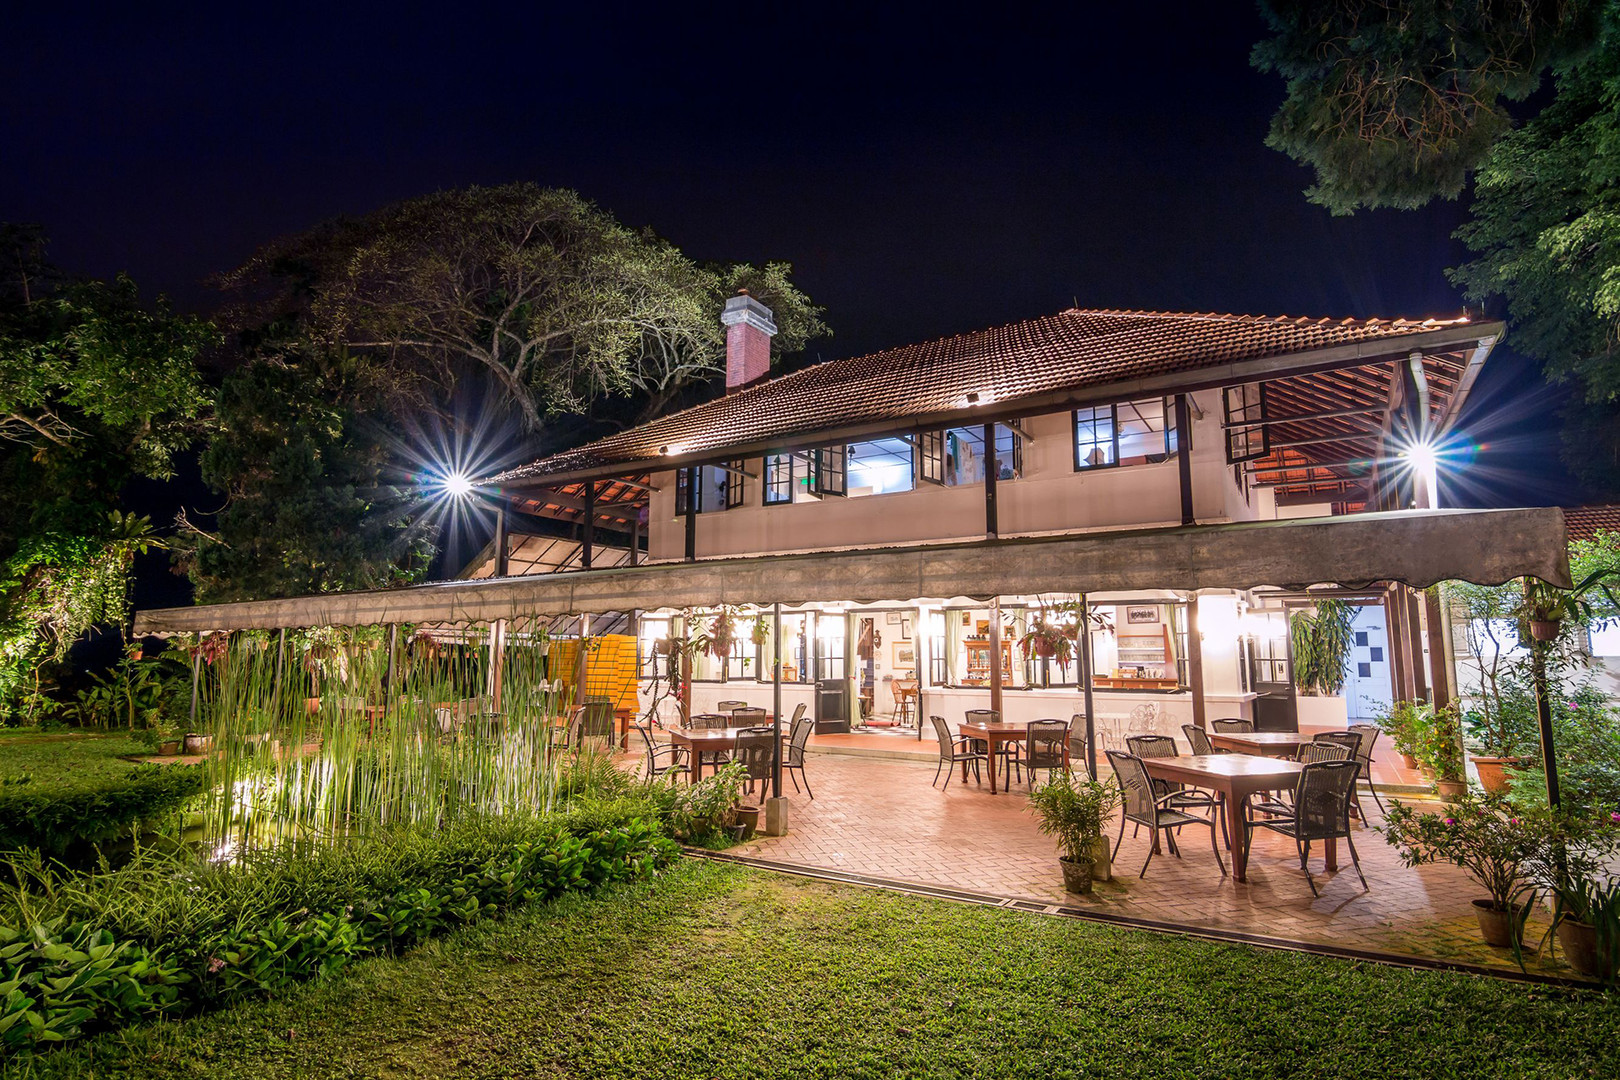 Penang Hill David Brown's Restaurant